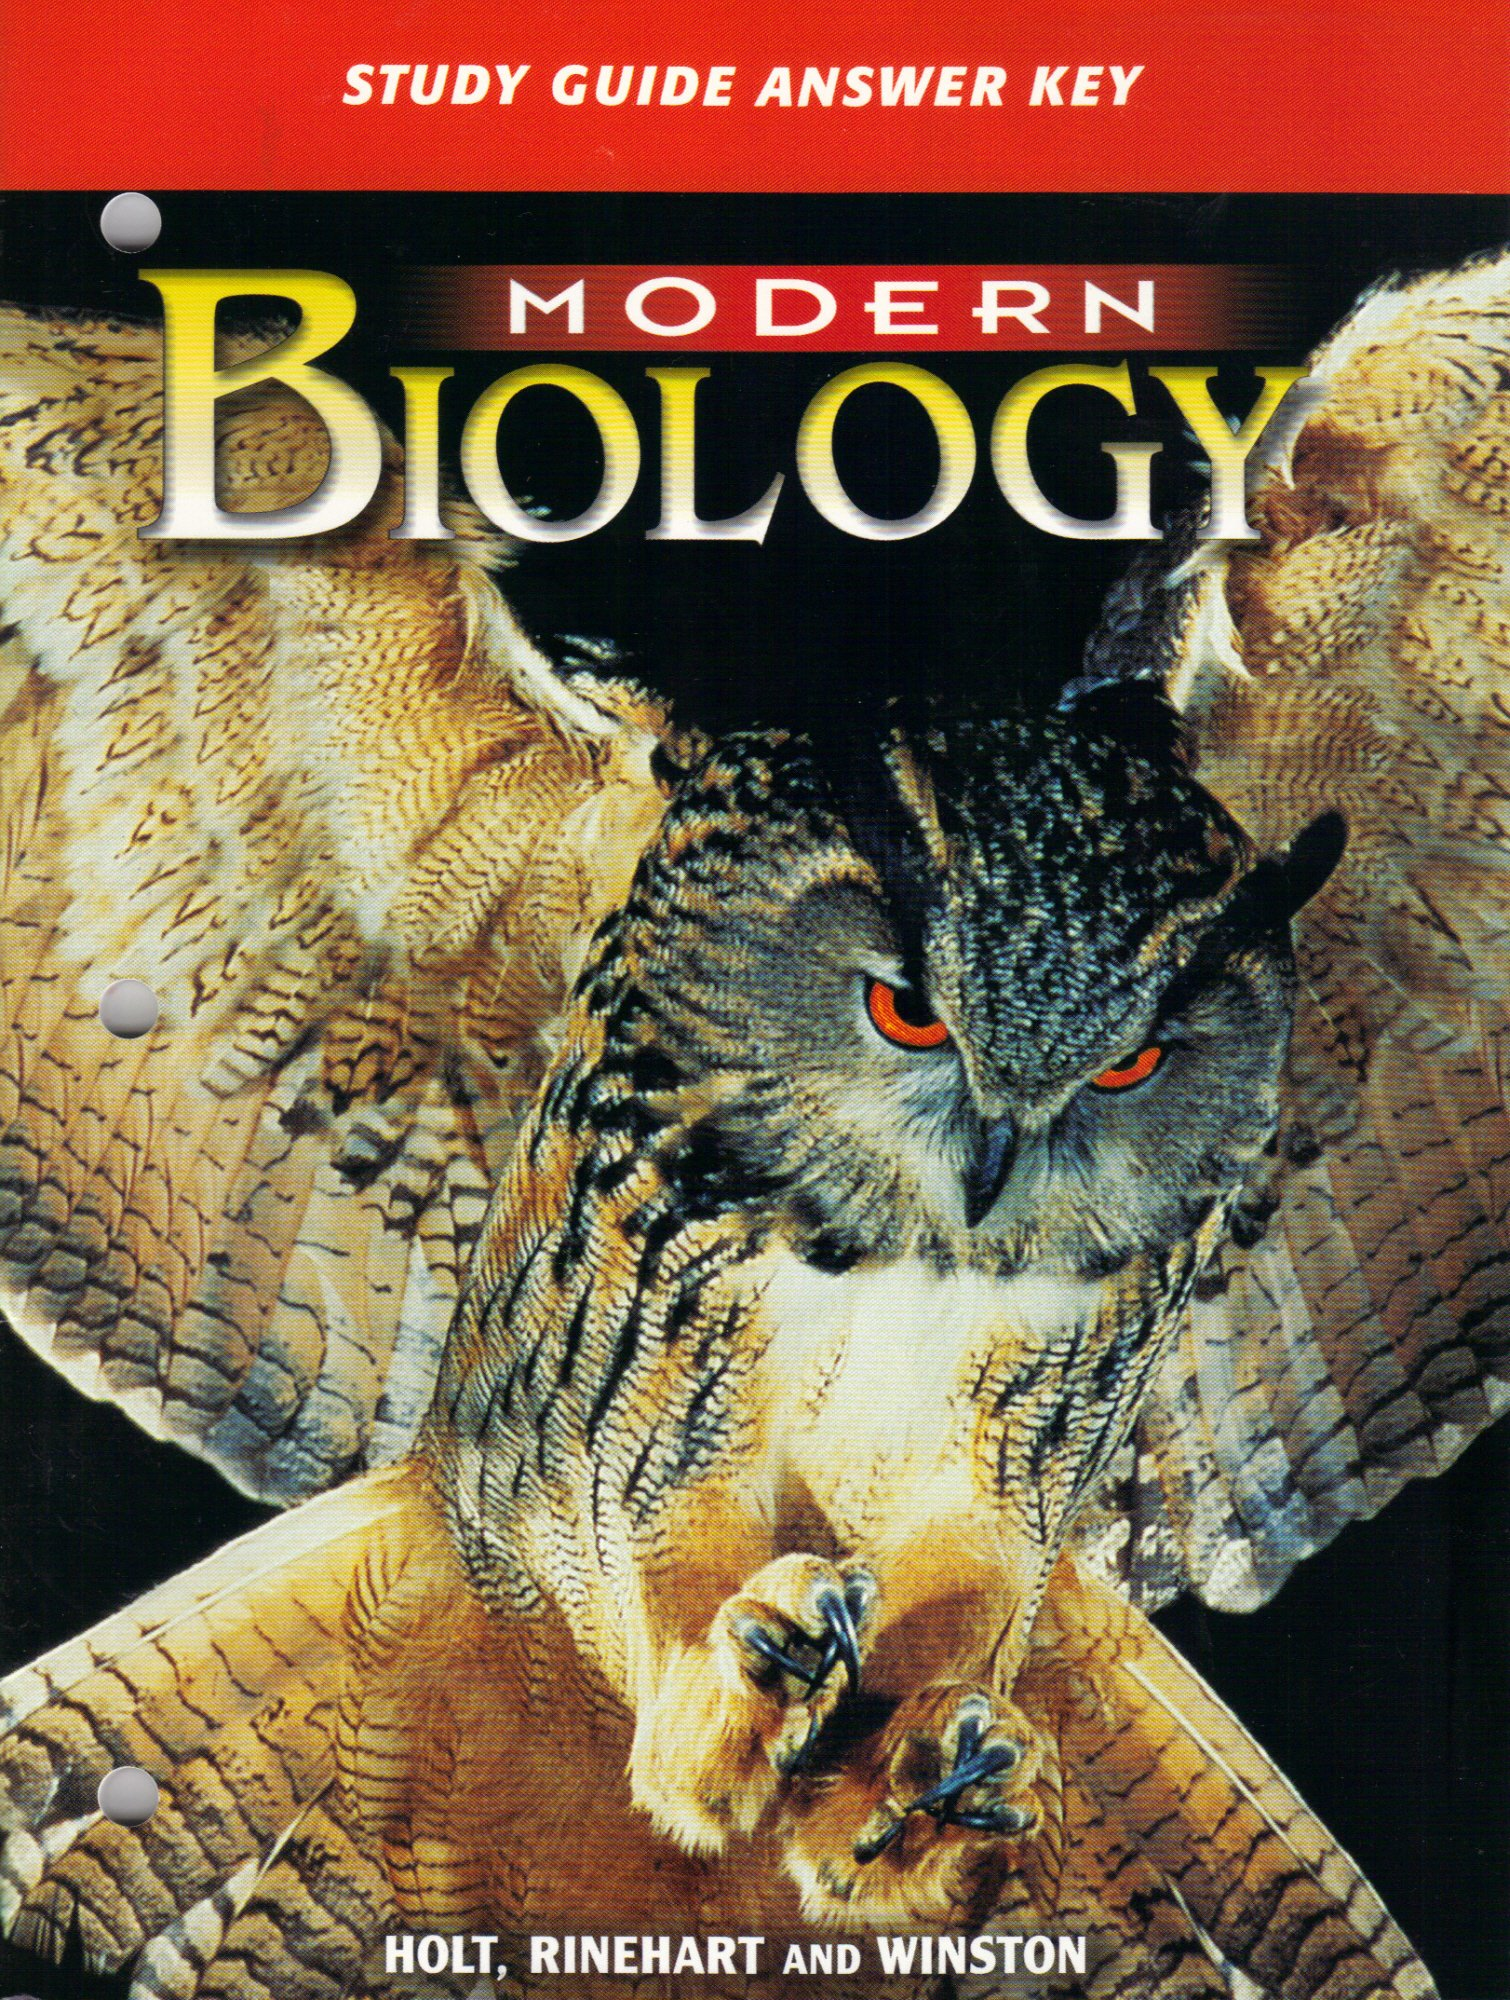 Modern Biology: Study Guide Answer Key: Winston Holt Rinehart:  9780030642746: Amazon.com: Books